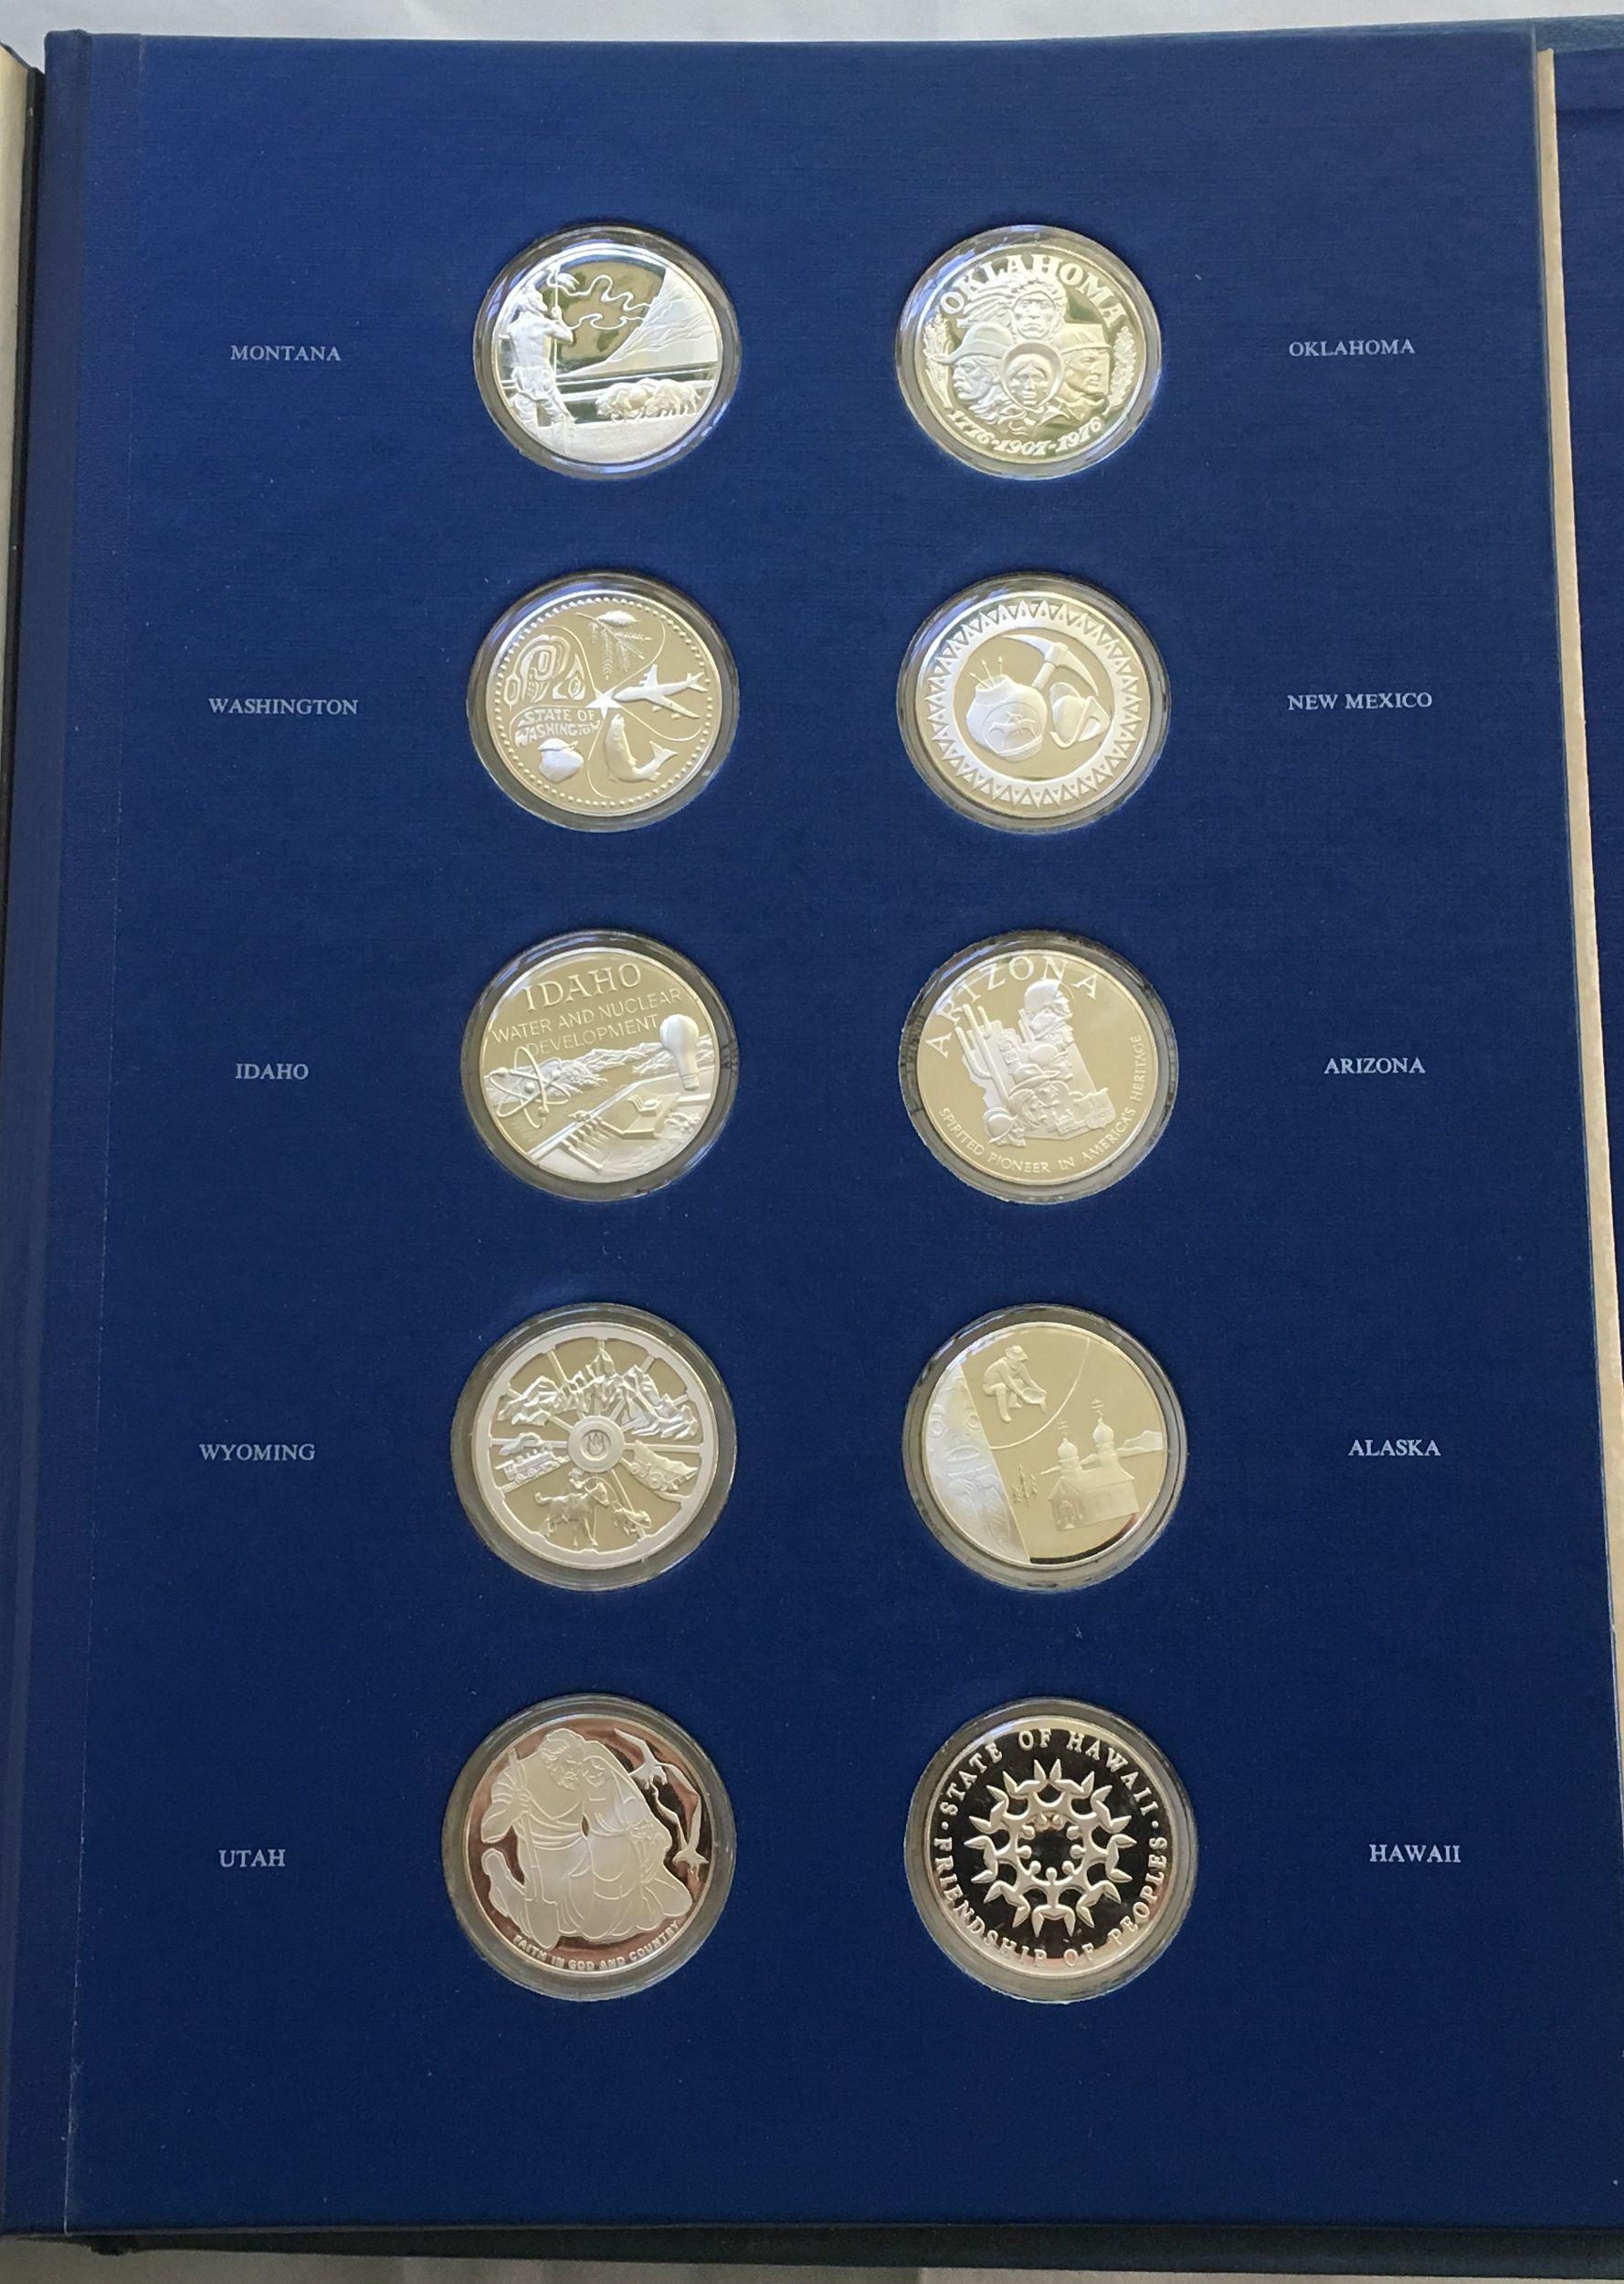 1976 franklin mint 50 state bicentennial silver medal